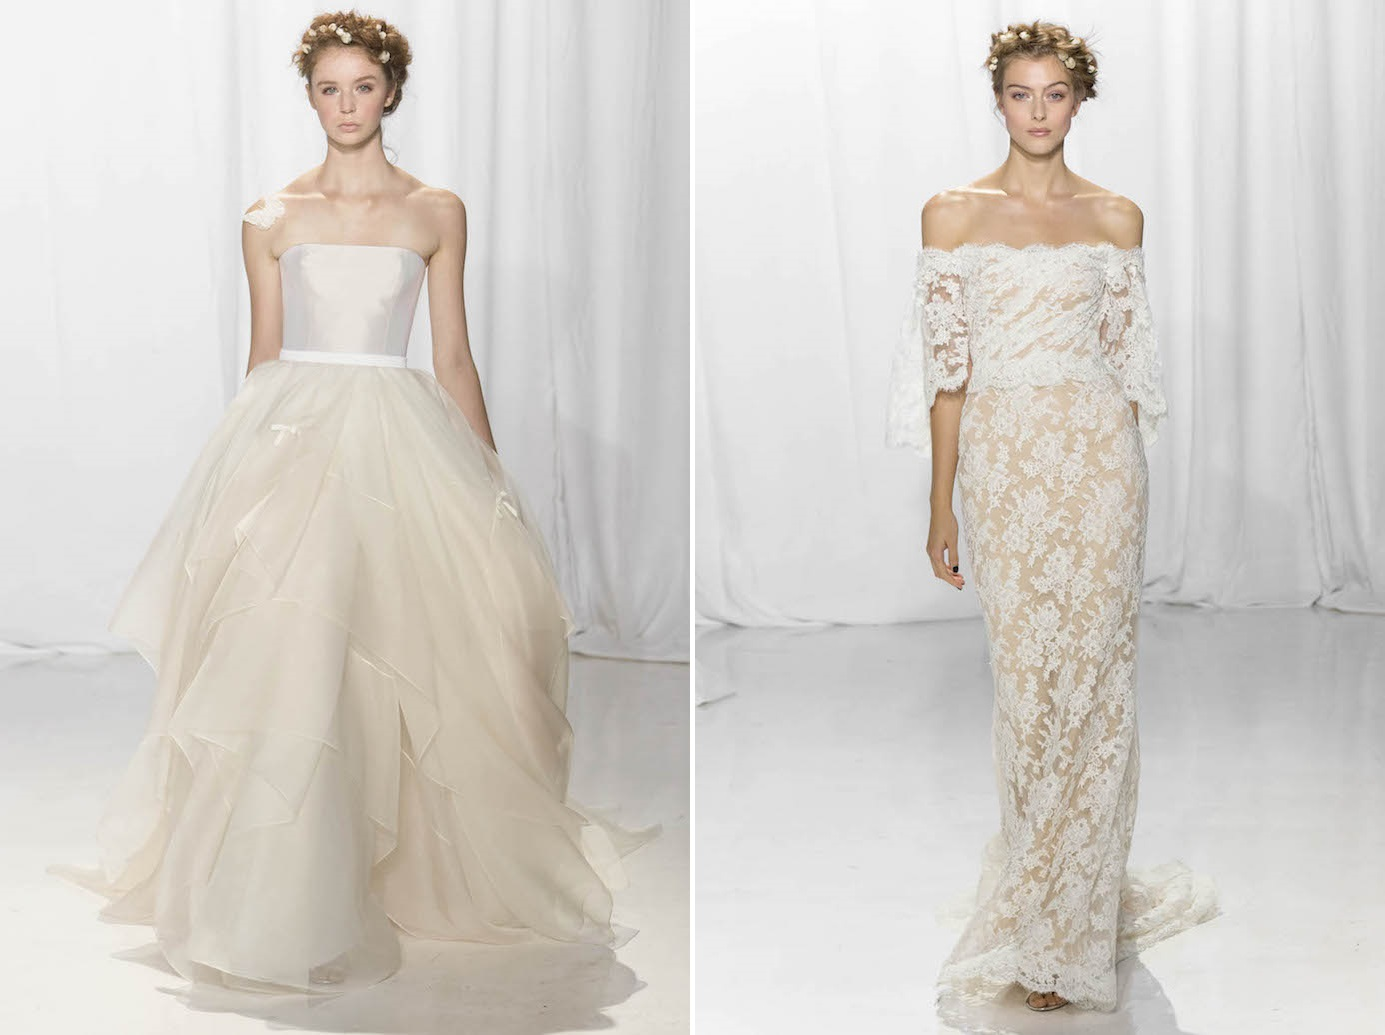 Reem Acra's Romantic 2017 Bridal Collection